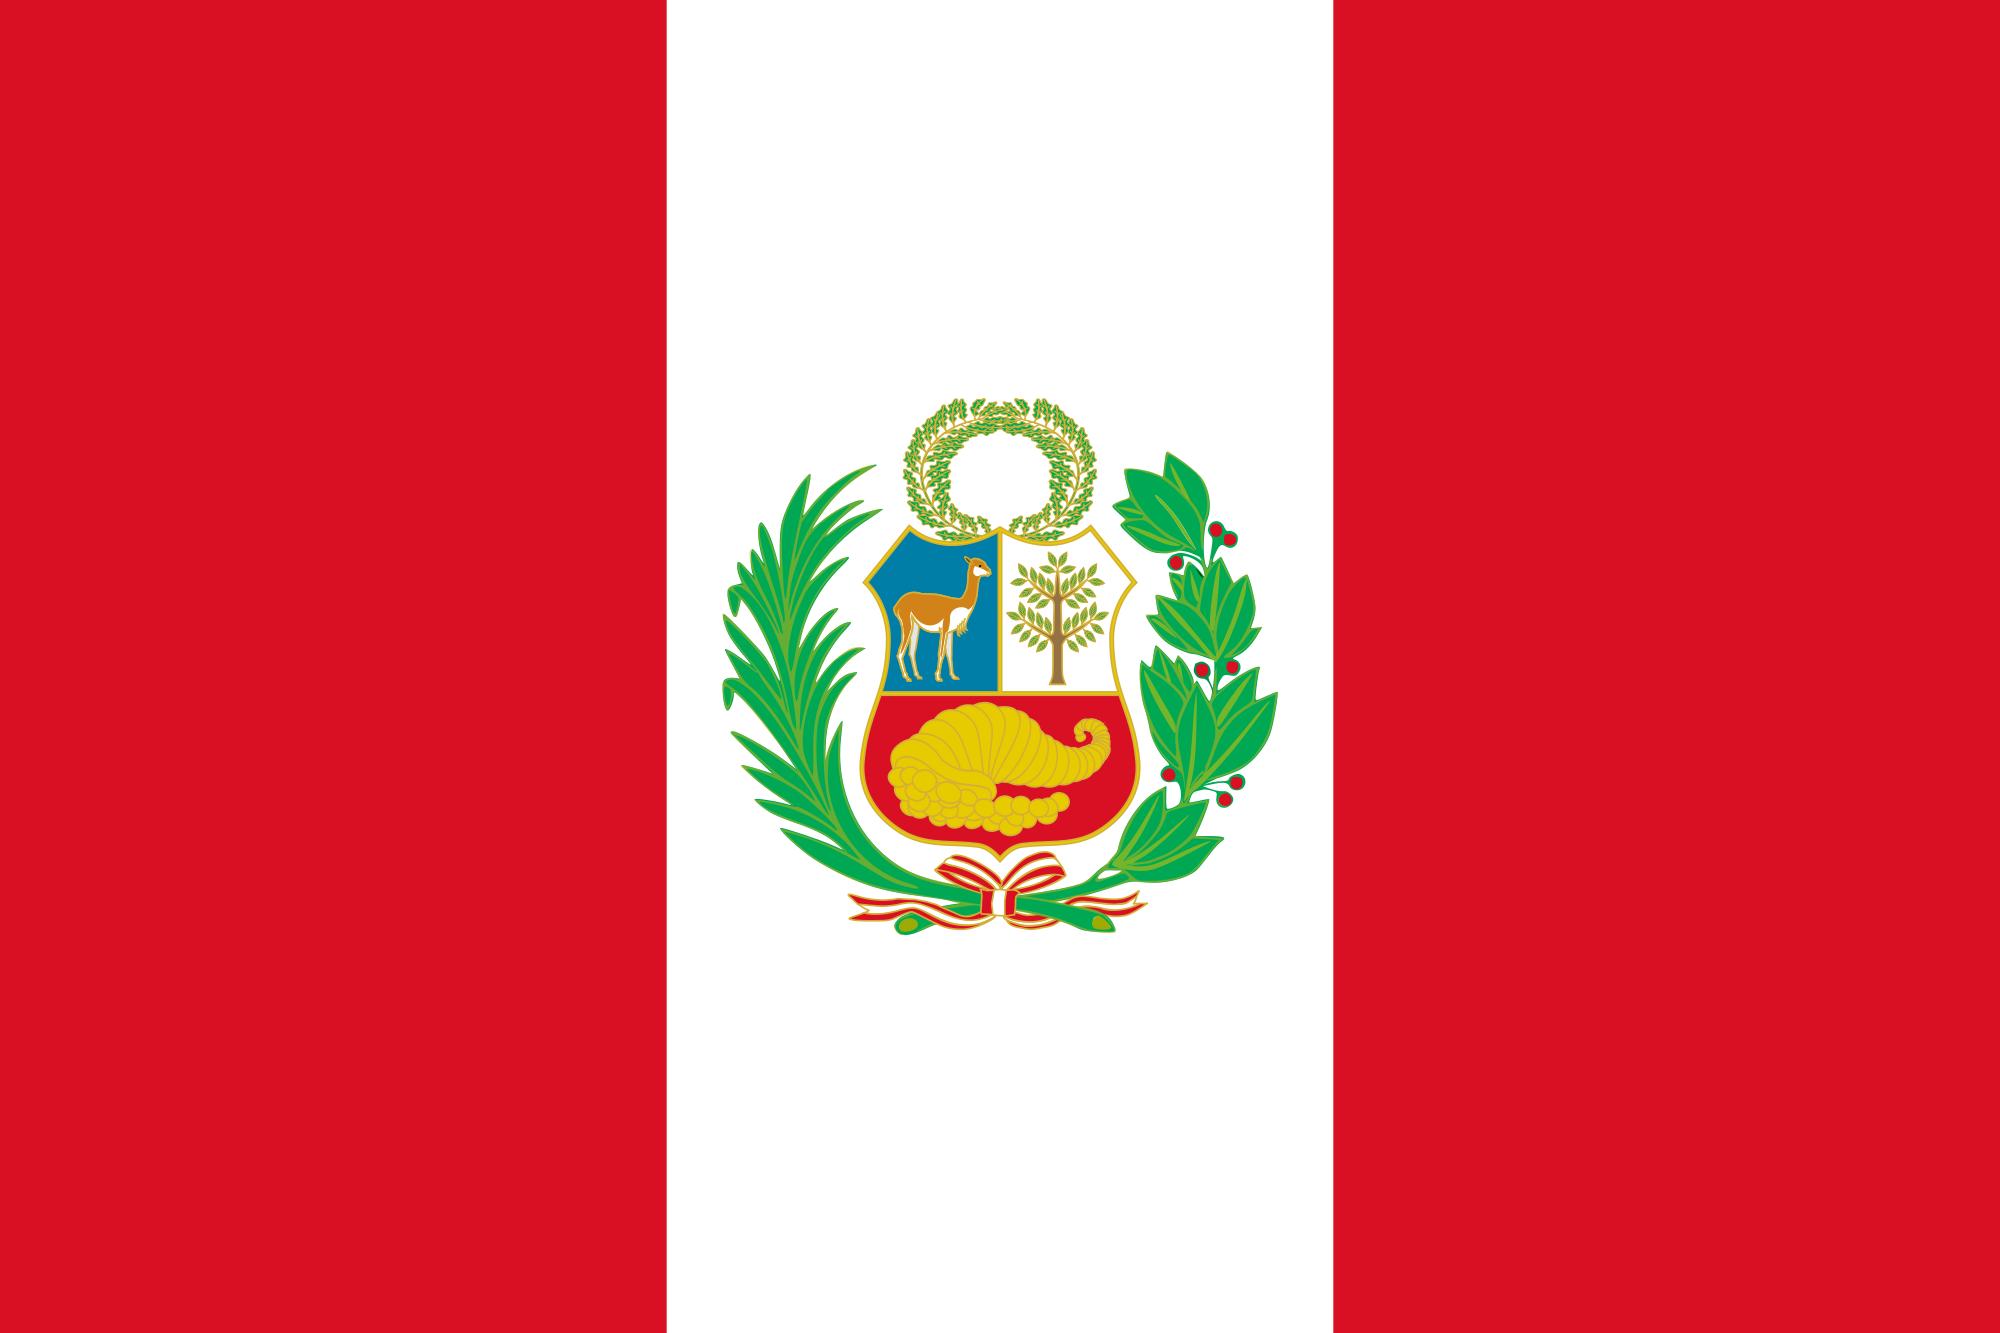 House of Peru